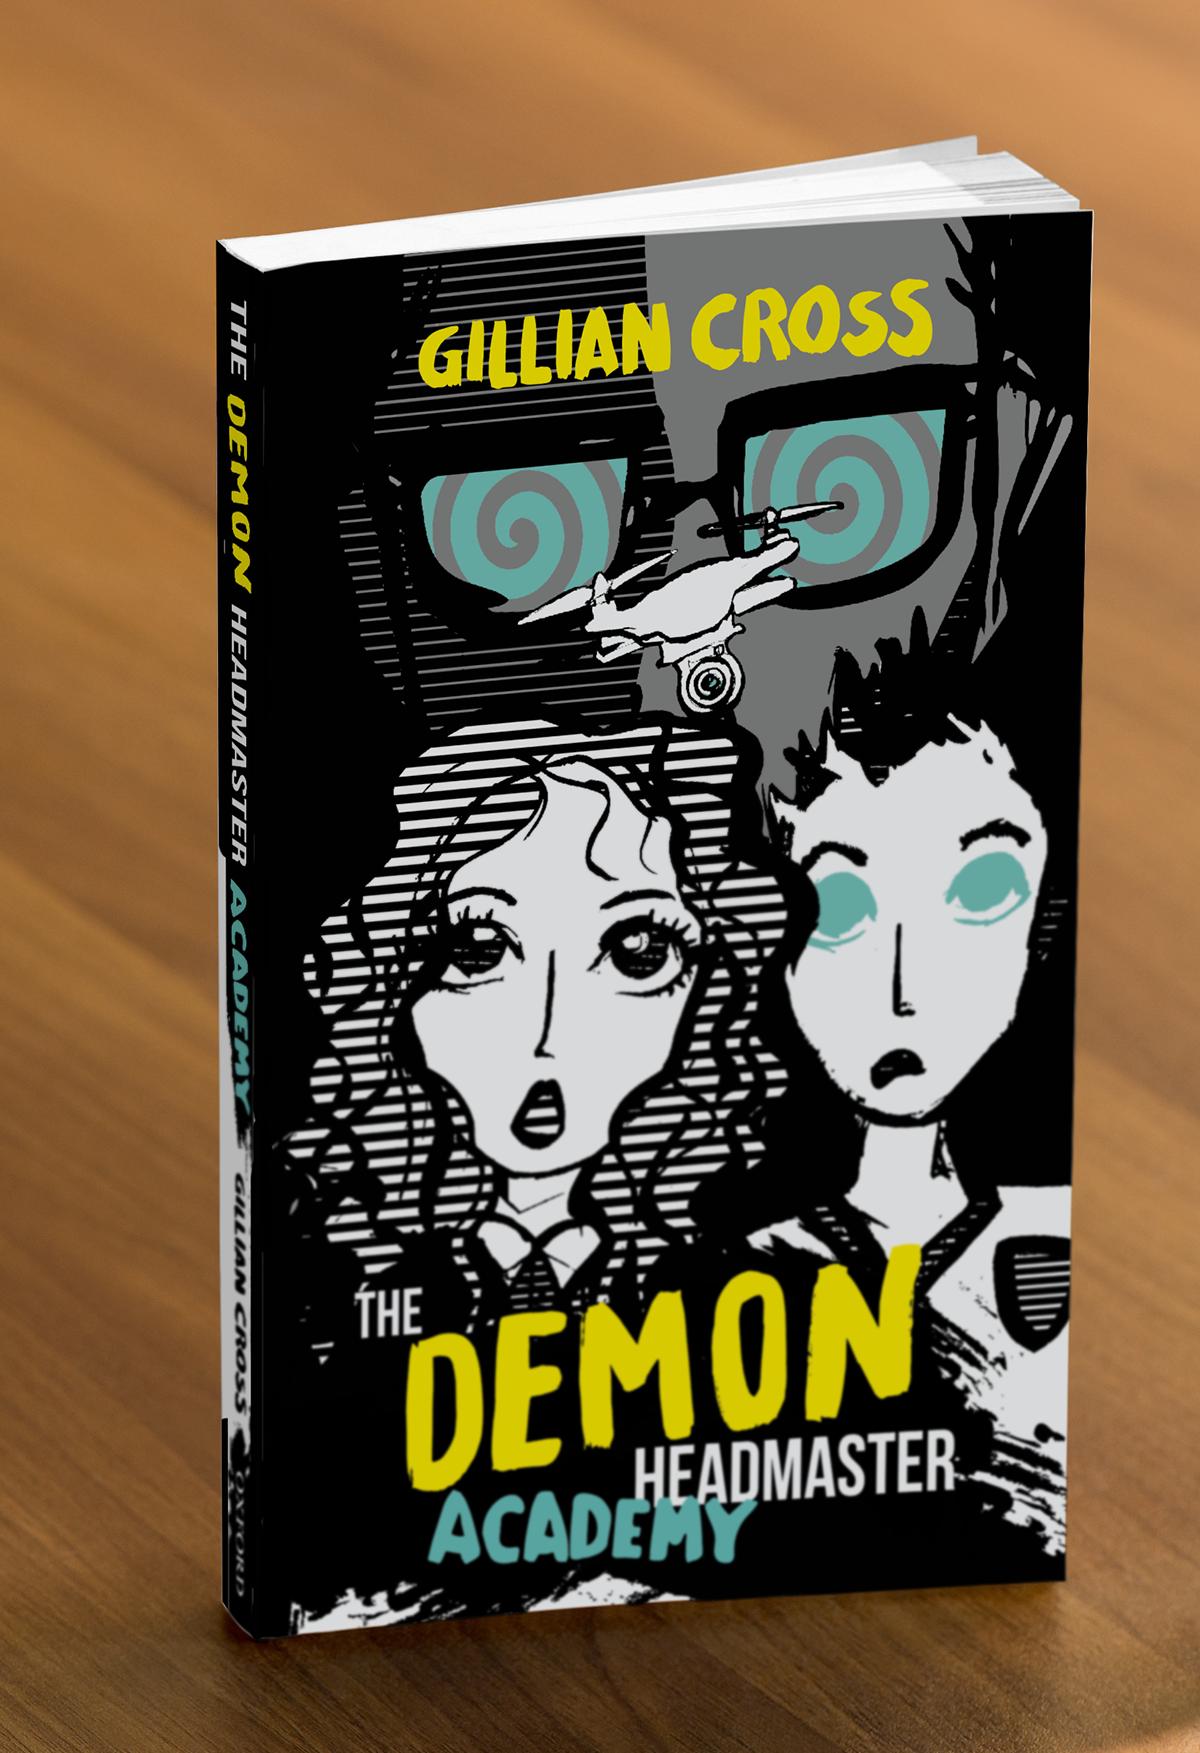 The Demon Headmaster Ebook